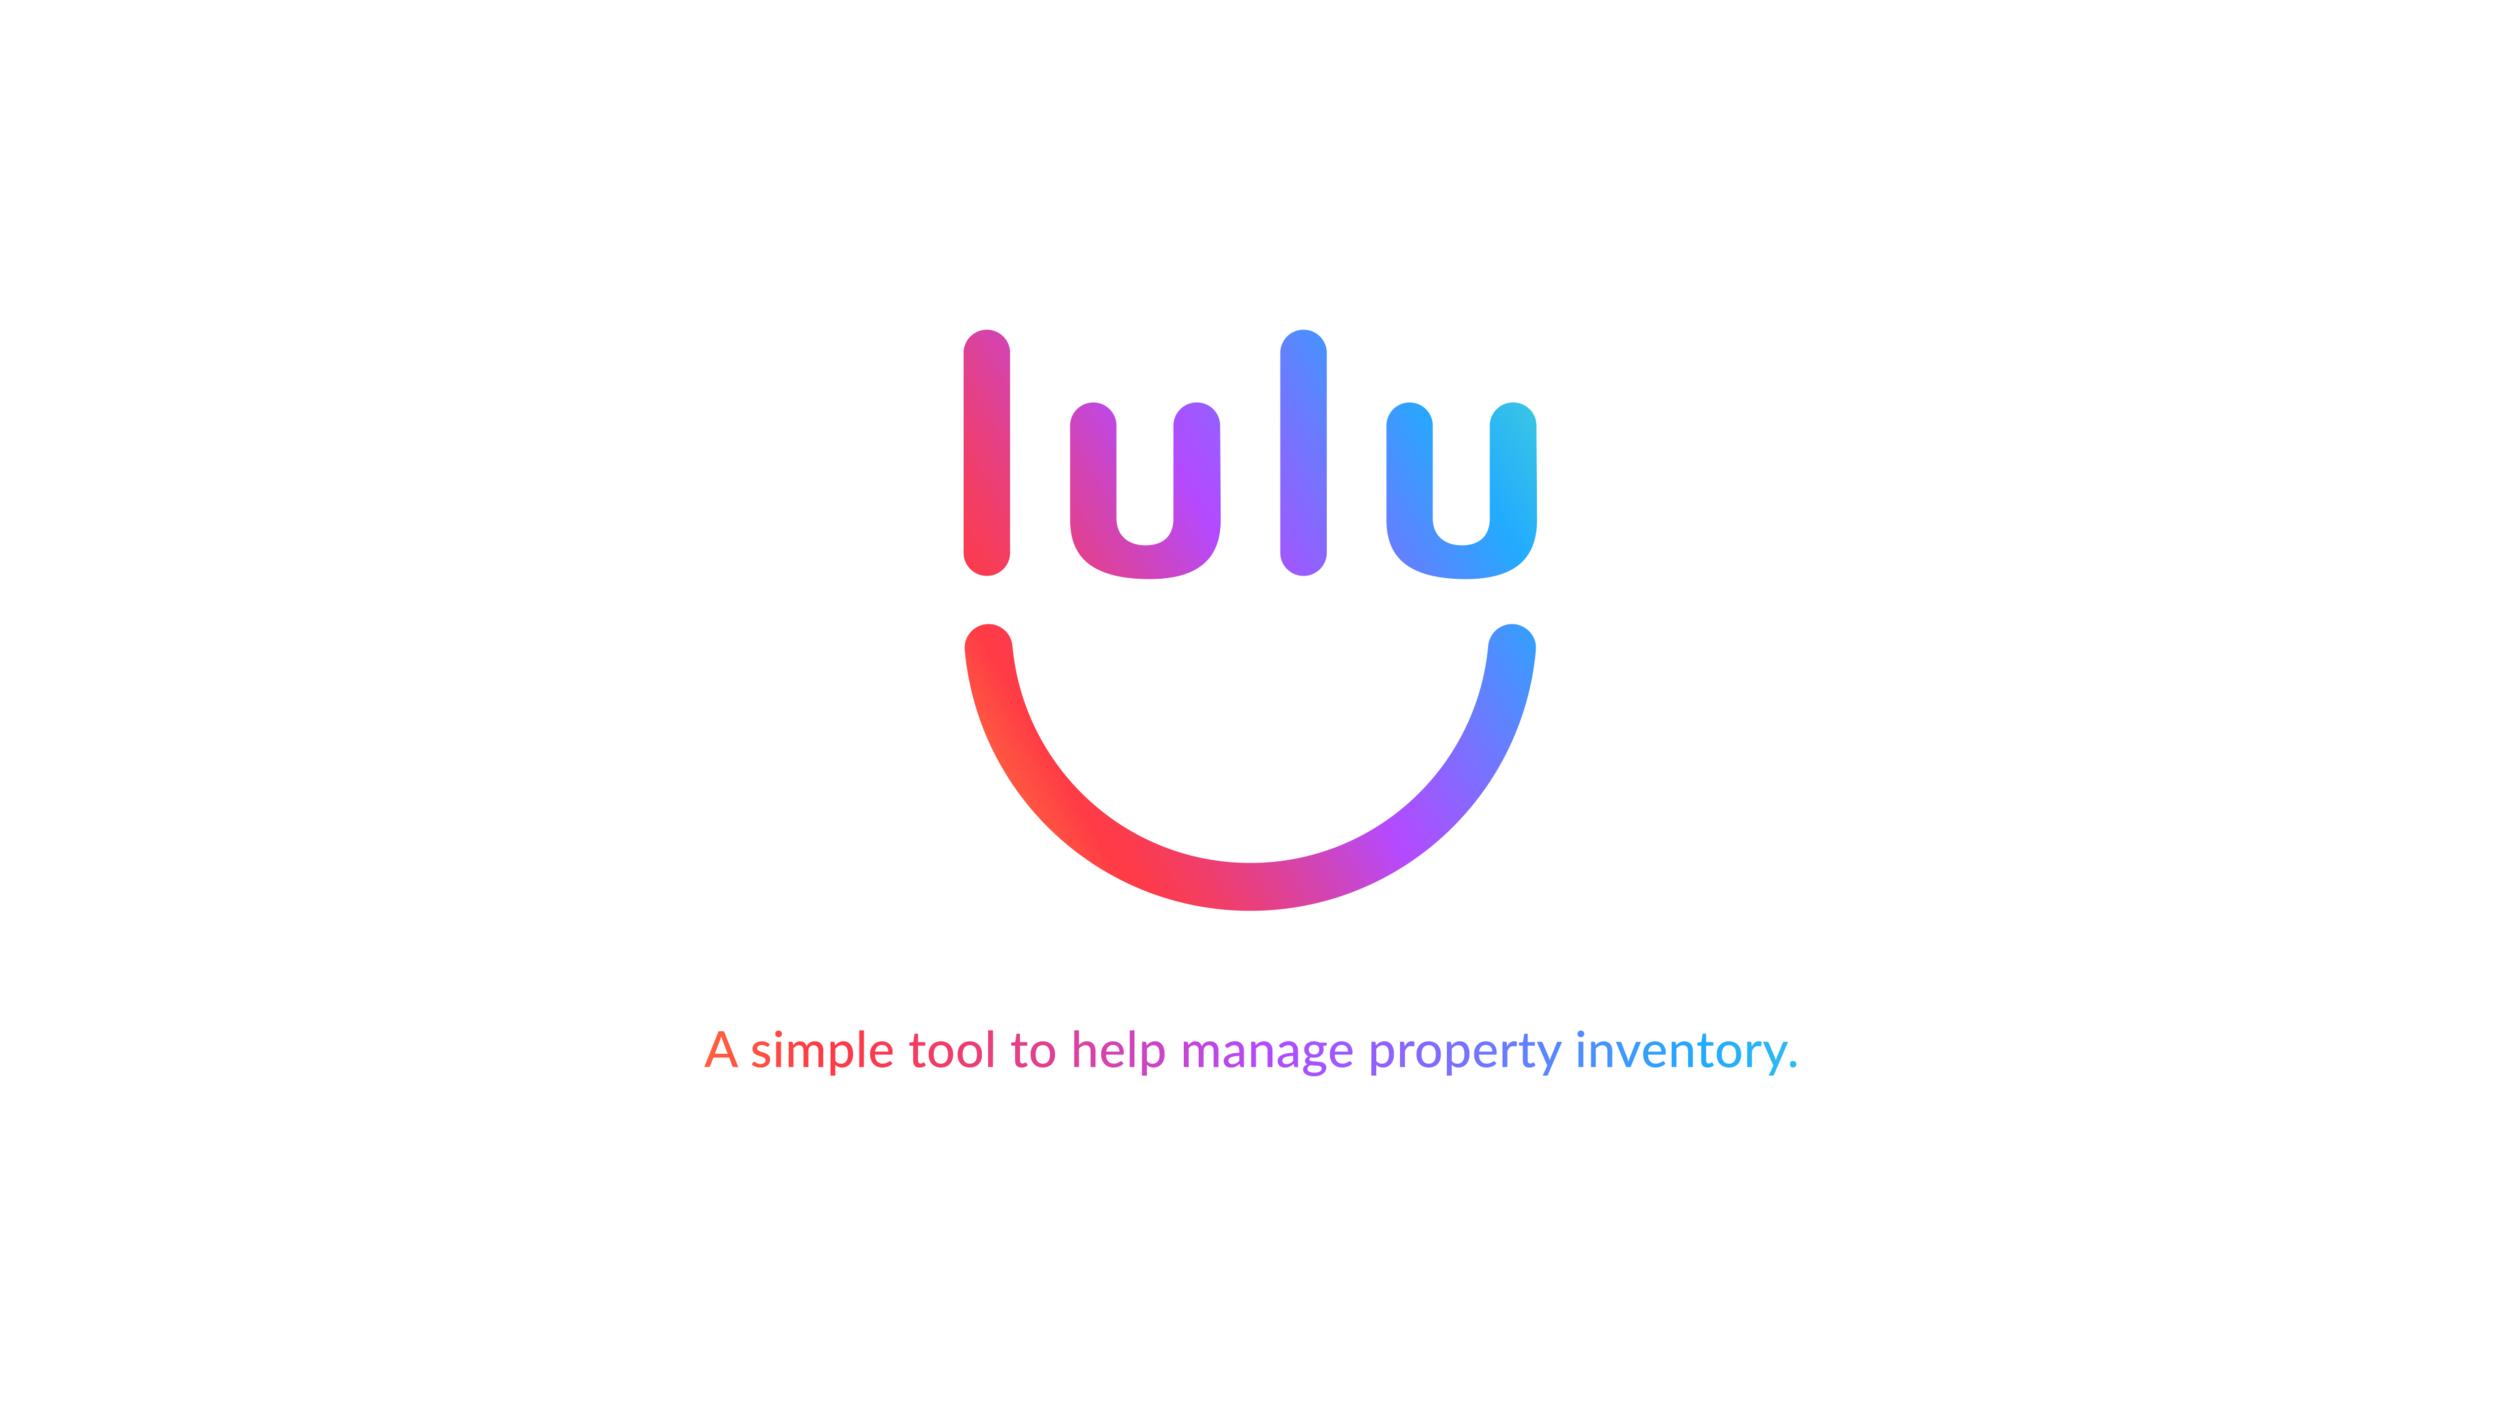 Lulu-Mark_2000x1124@2x.png